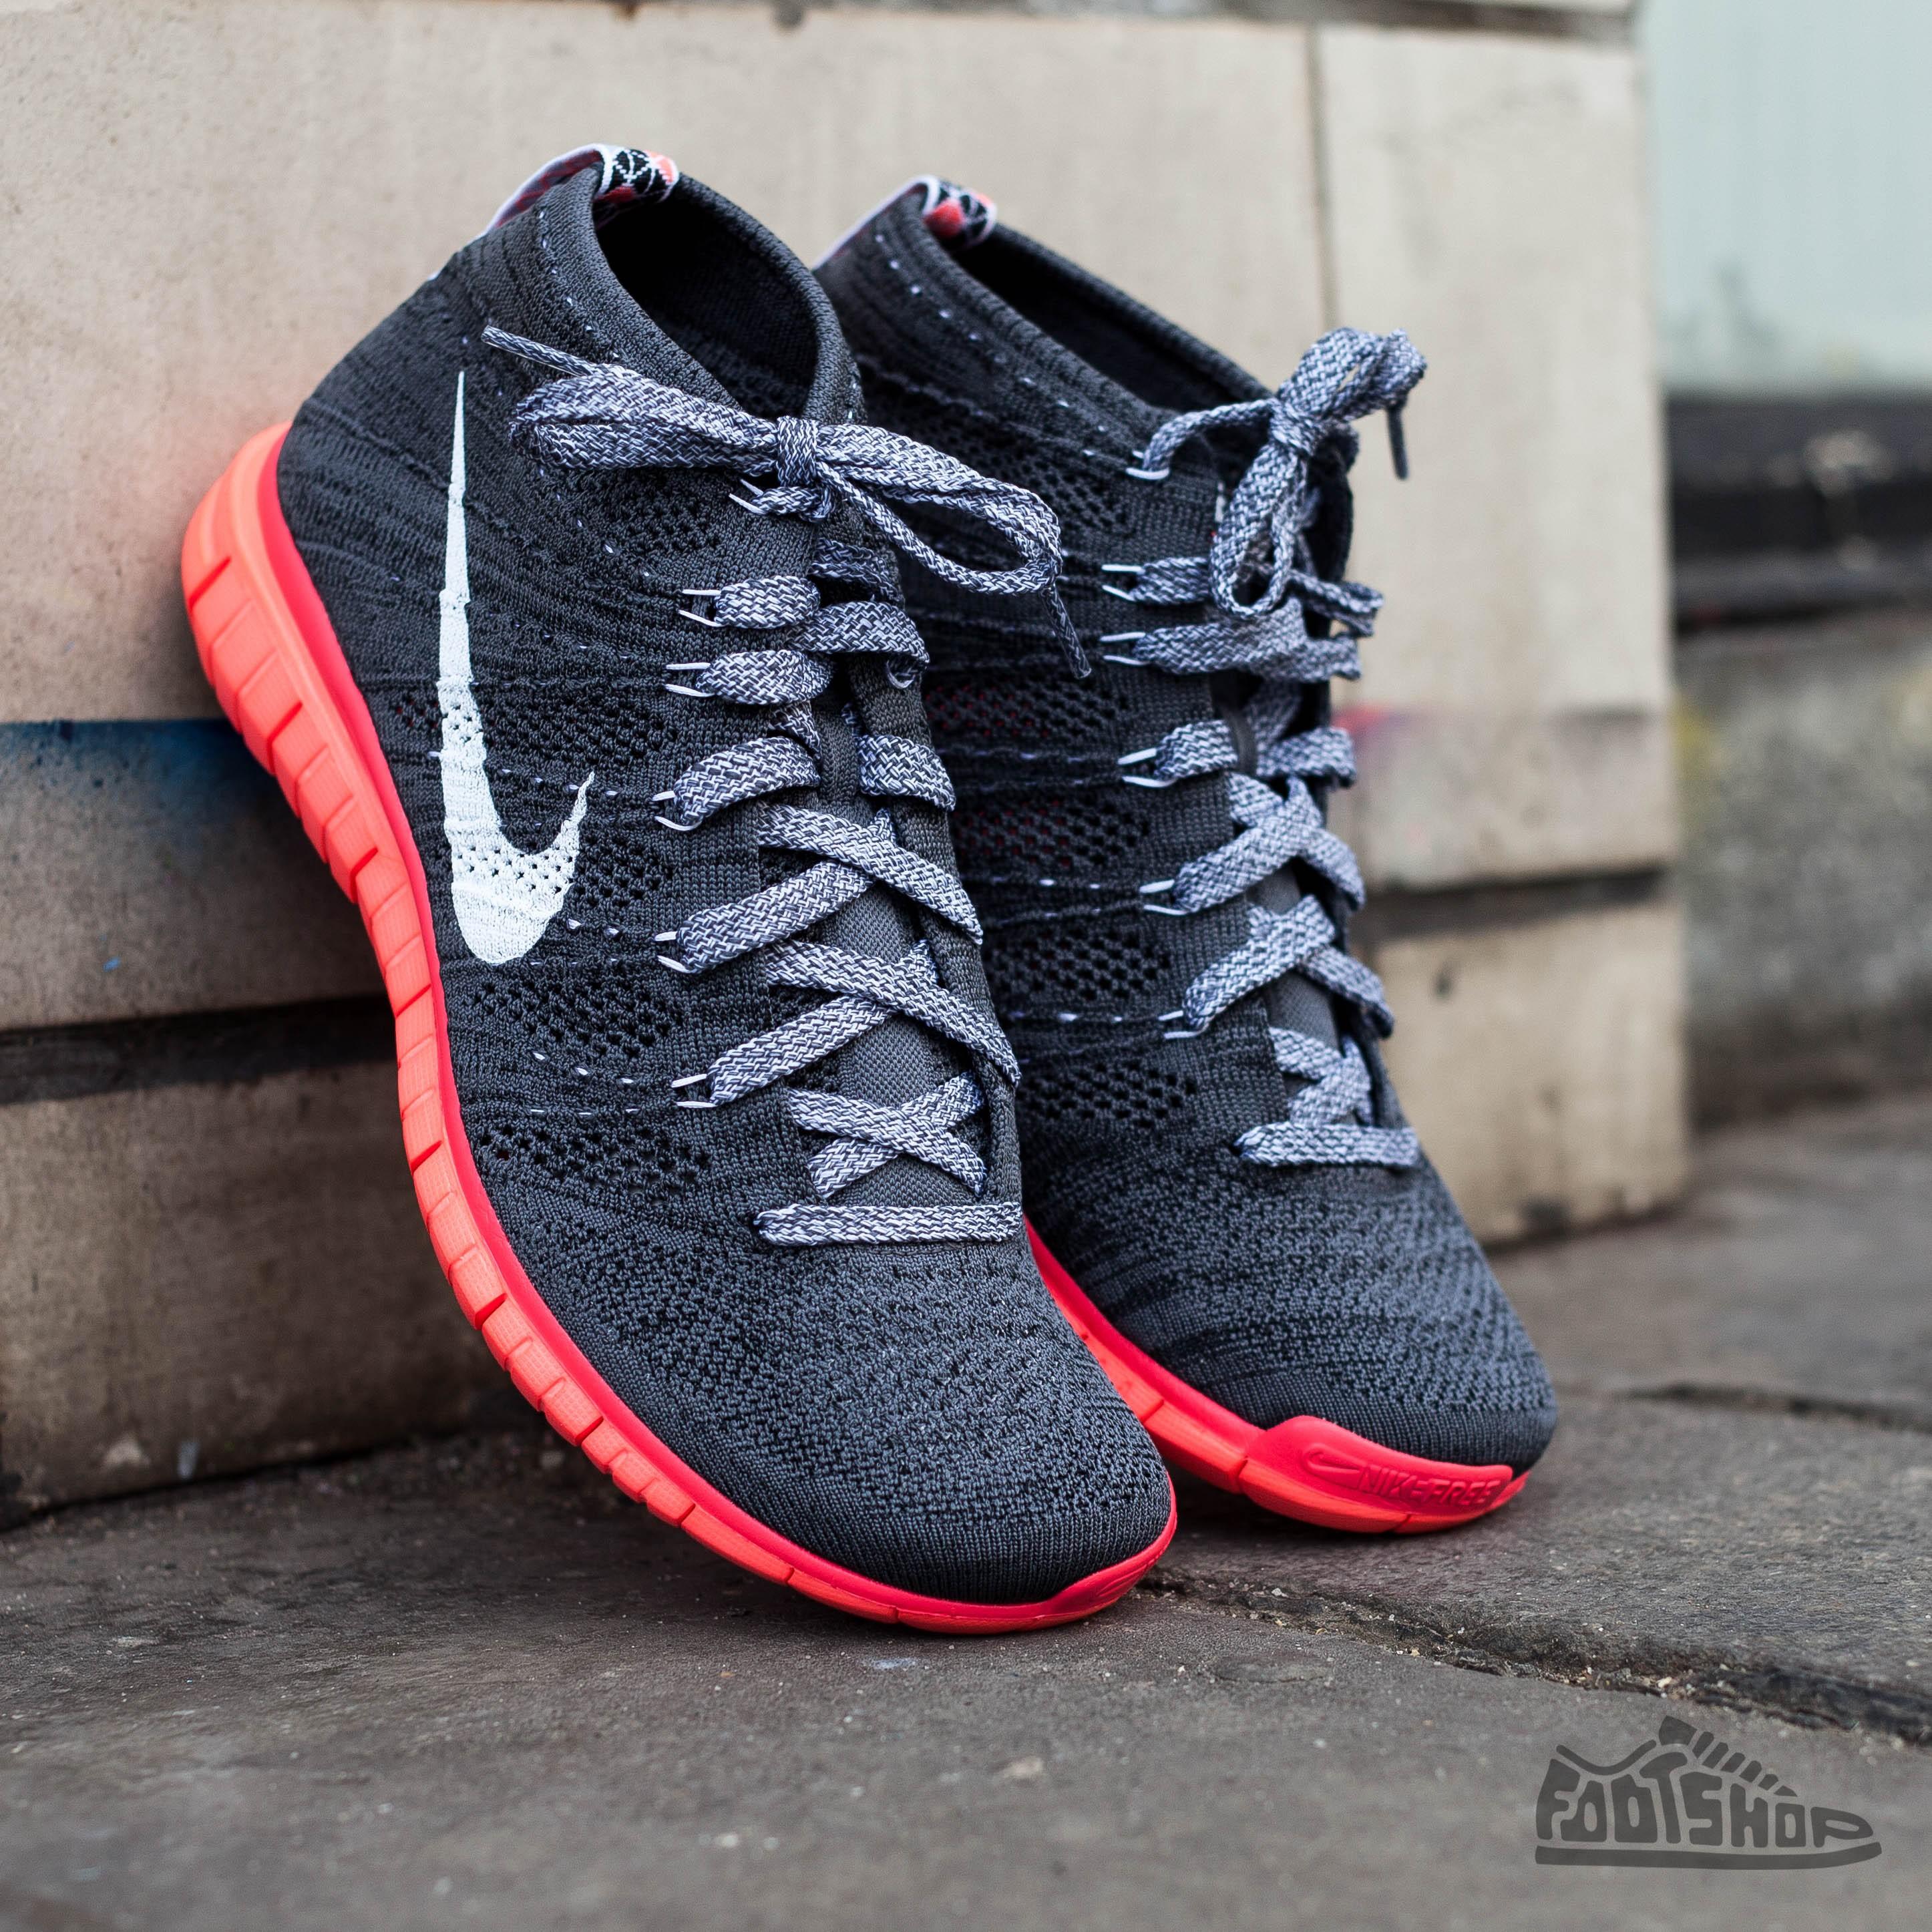 promo code e7172 bf2c3 Nike Free Flyknit Chukka Dark Grey White Black Hot Lava